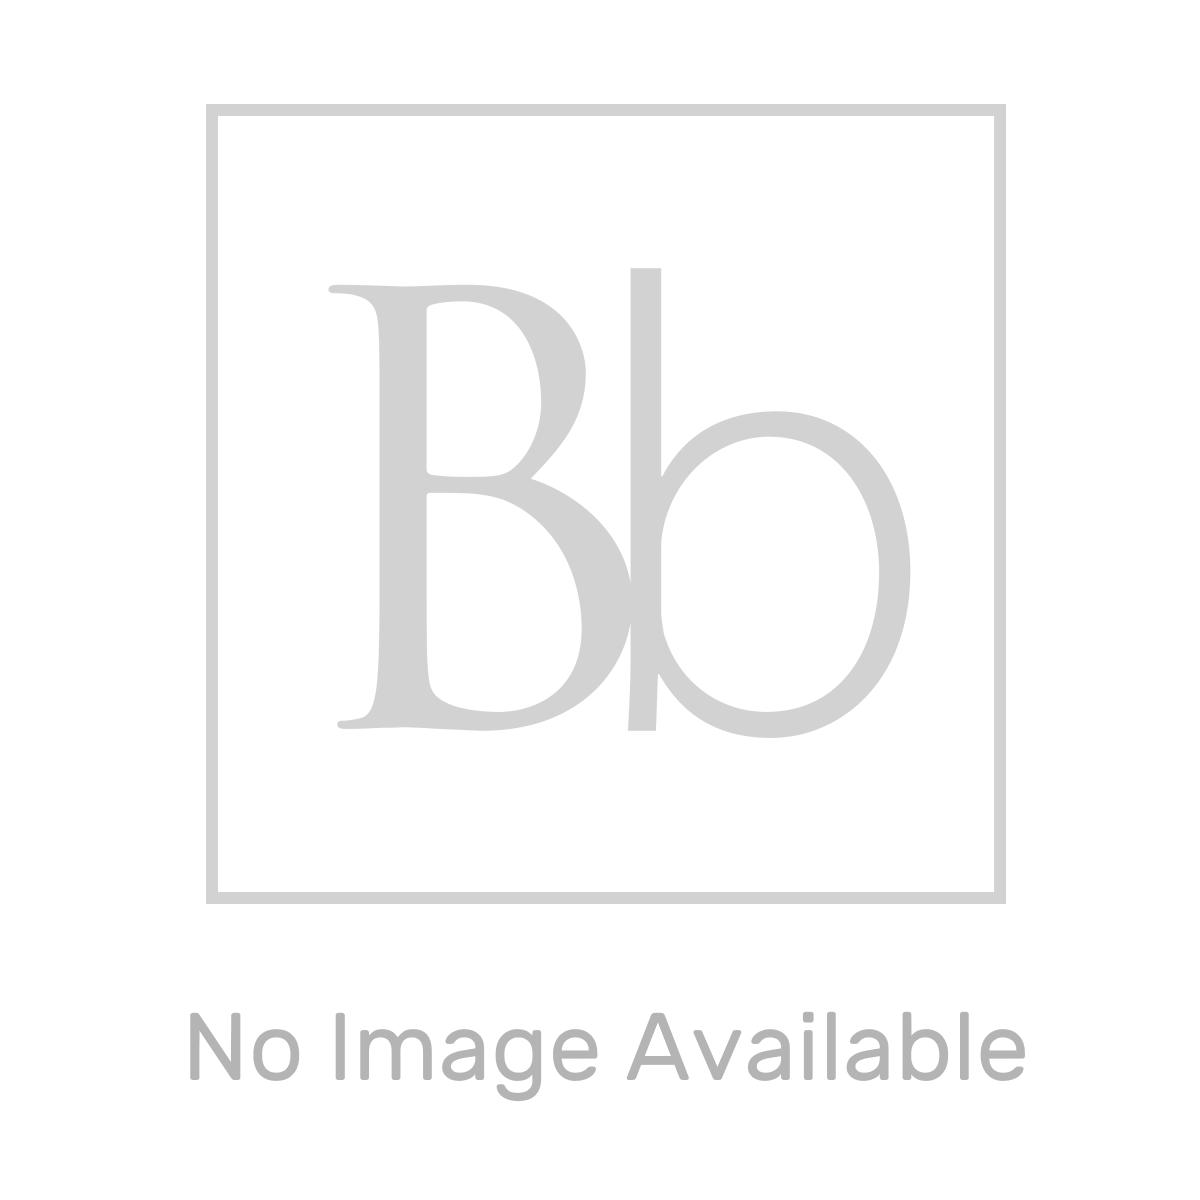 Moods Tudor Gloss White Acrylic Bath End Panel 750mm